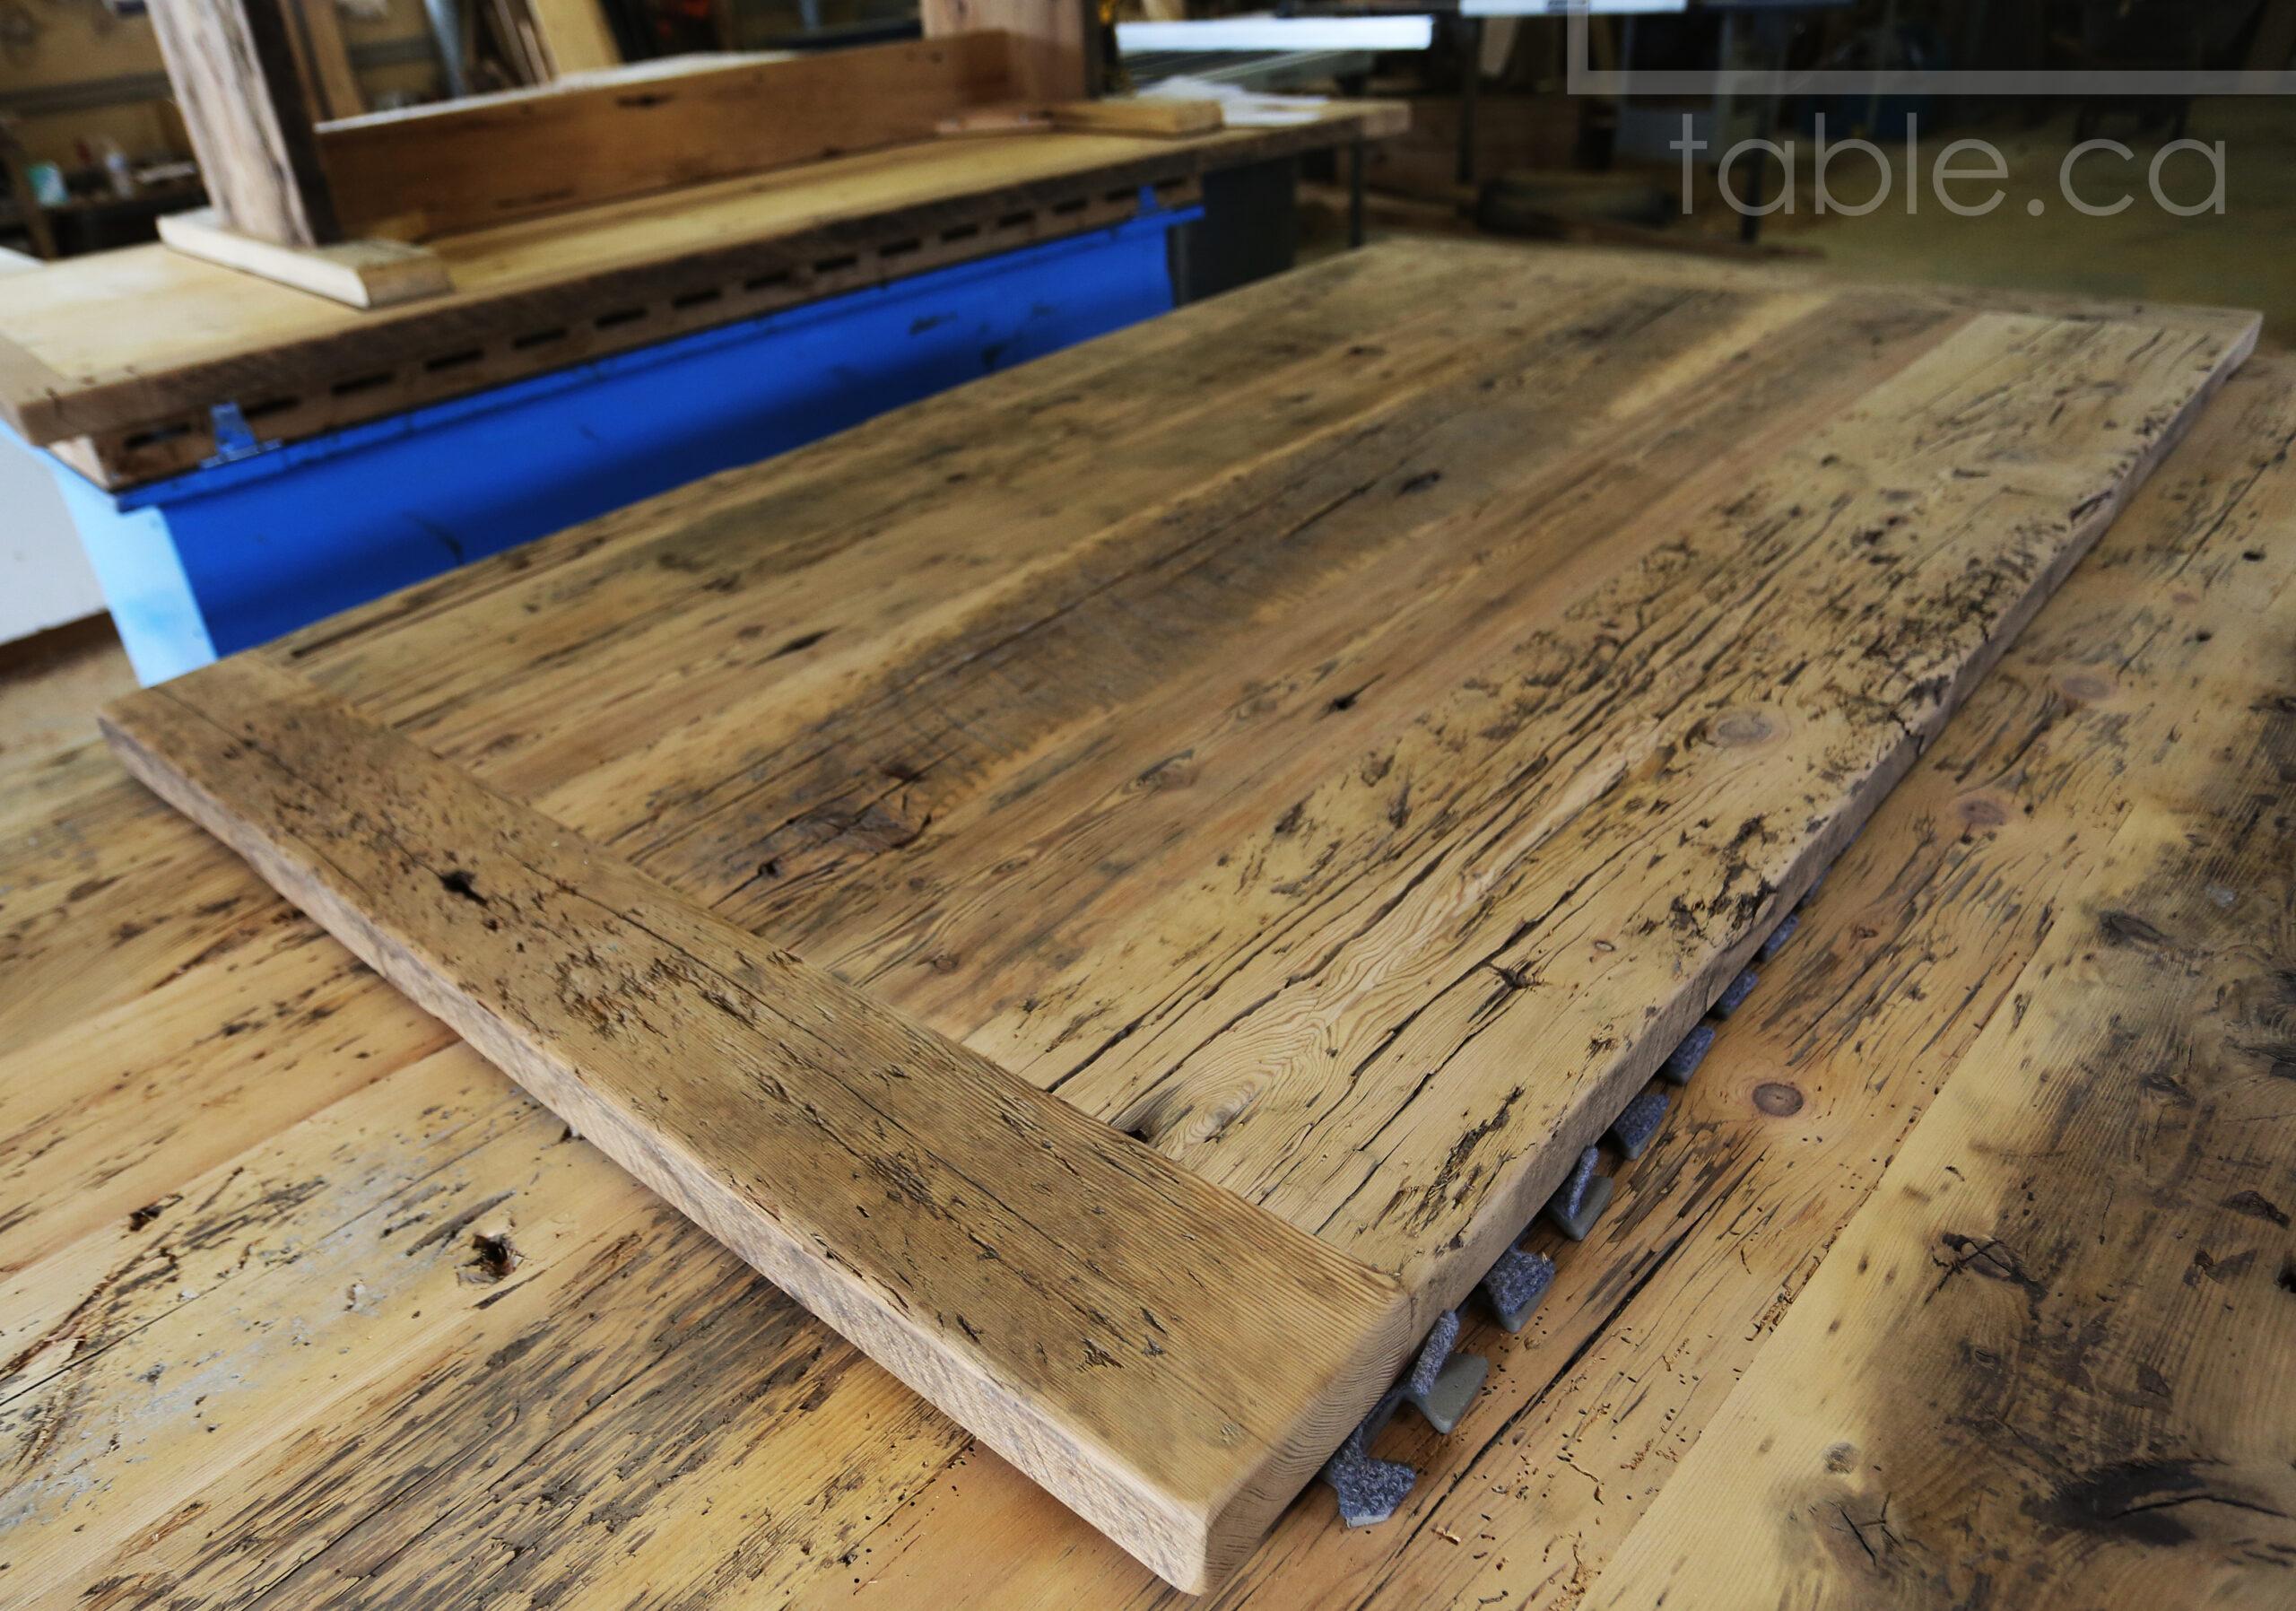 "6' Ontario Barnwood Steel Base Table we made for a Brantford home - 42"" wide - 2"" Hemlock Threshing Floor Top -  Original edges & distressing maintained - U Shaped Matte Black Metal Base - Premium epoxy + satin polyurethane finish - www.table.ca"